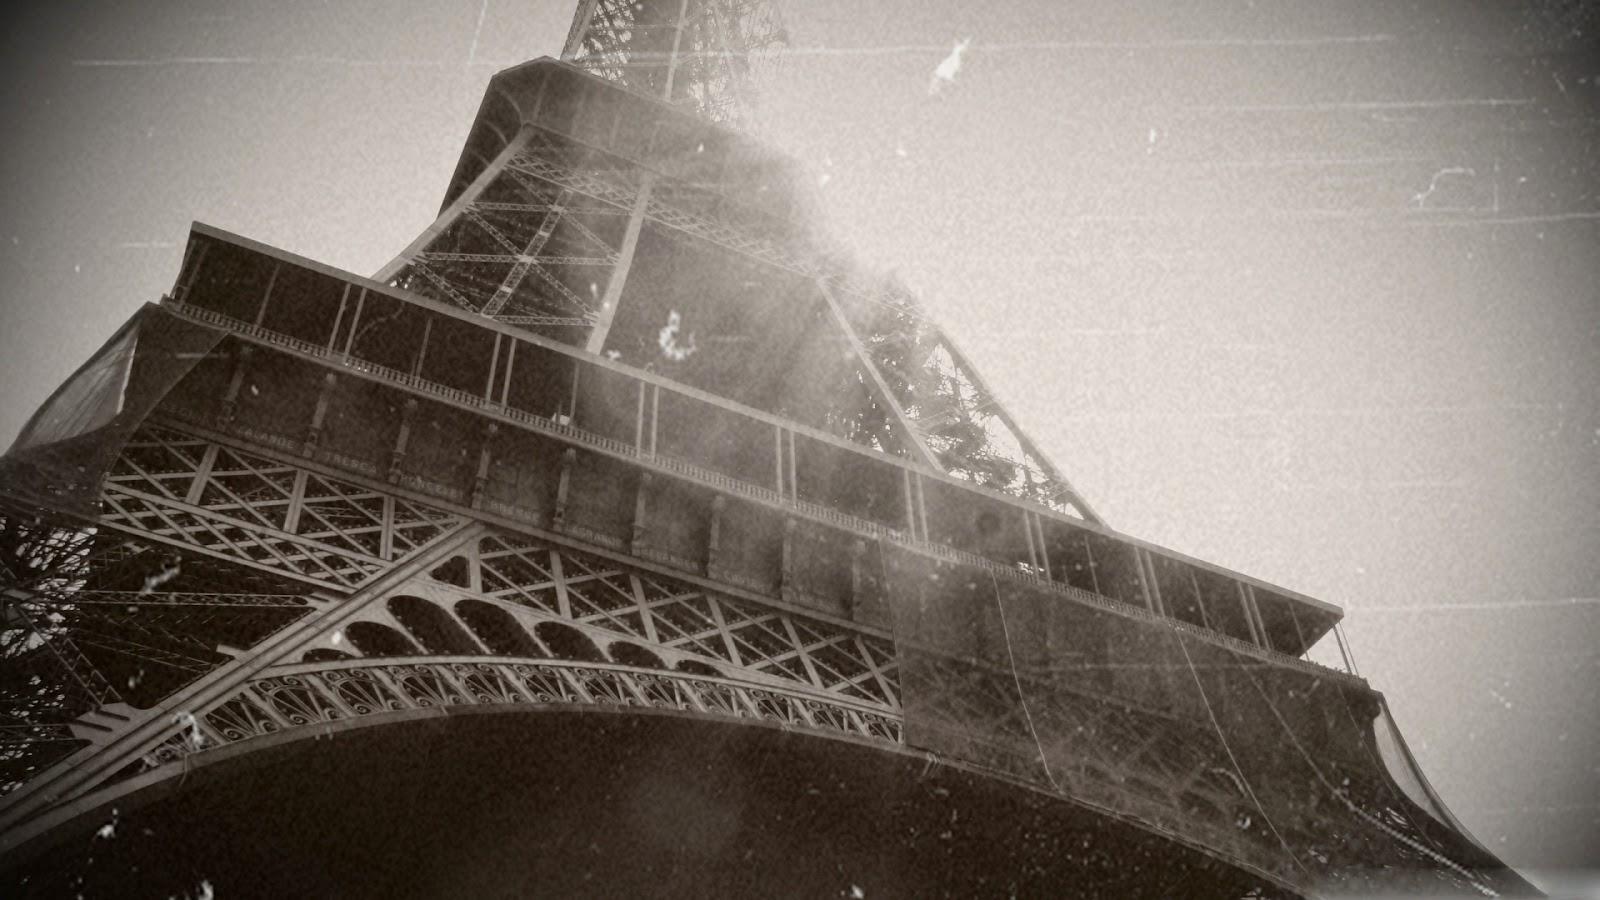 Hd Desktop Wallpapers Paris Wallpapers